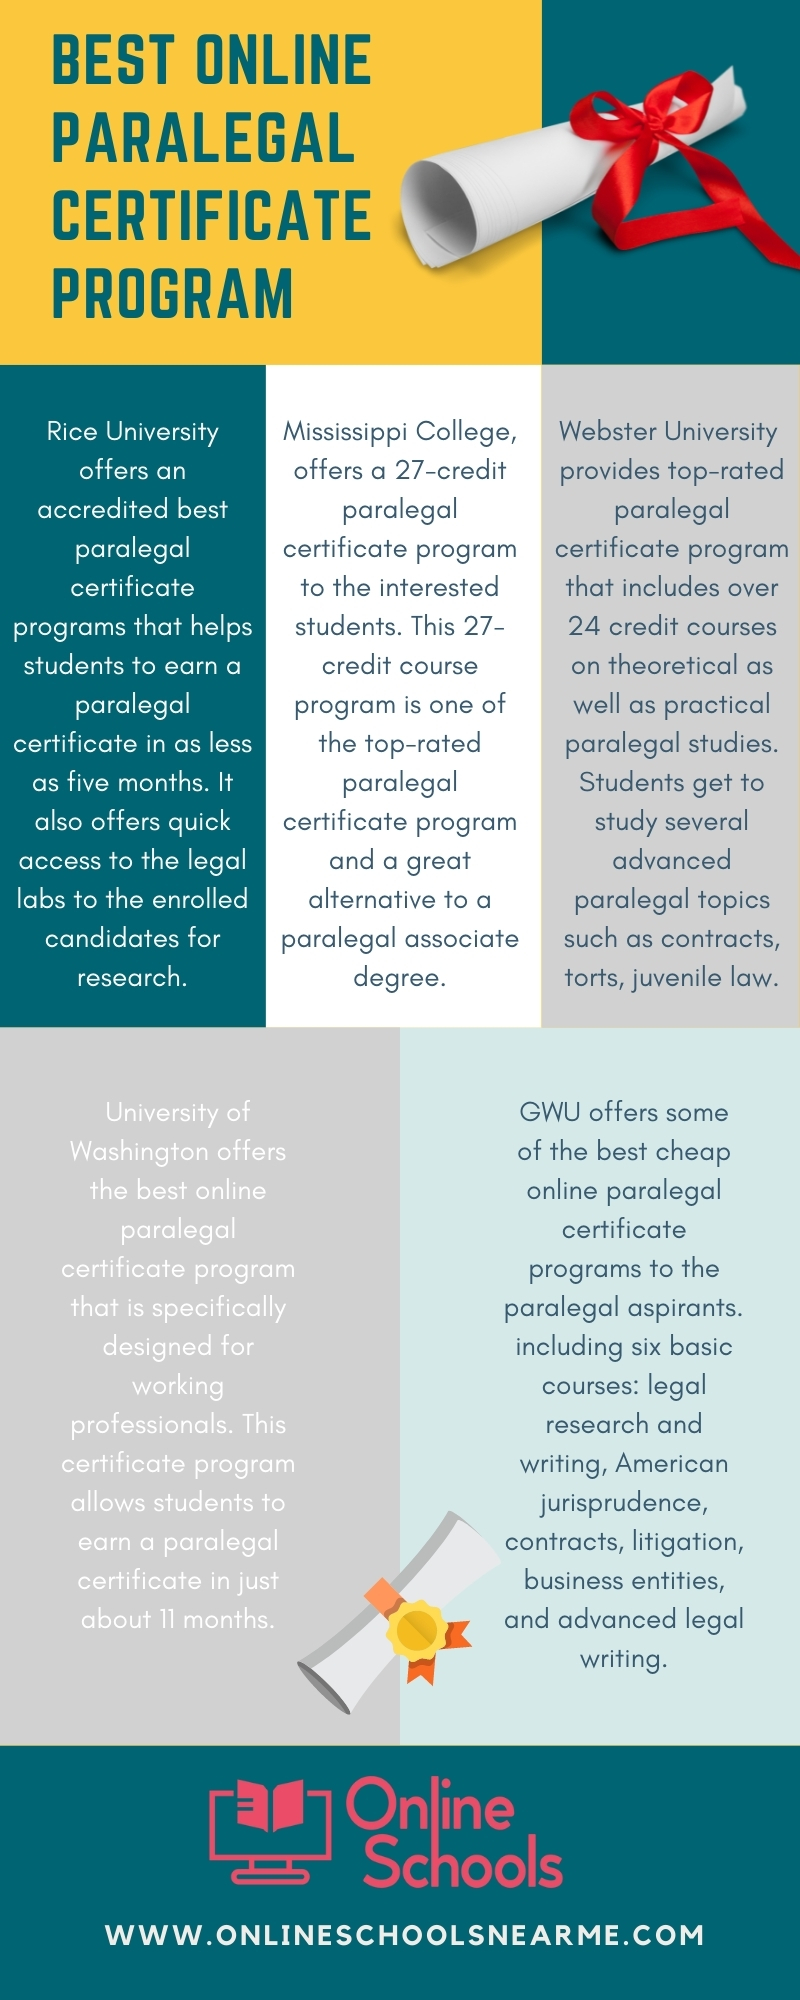 Best Online Paralegal Certificate Program